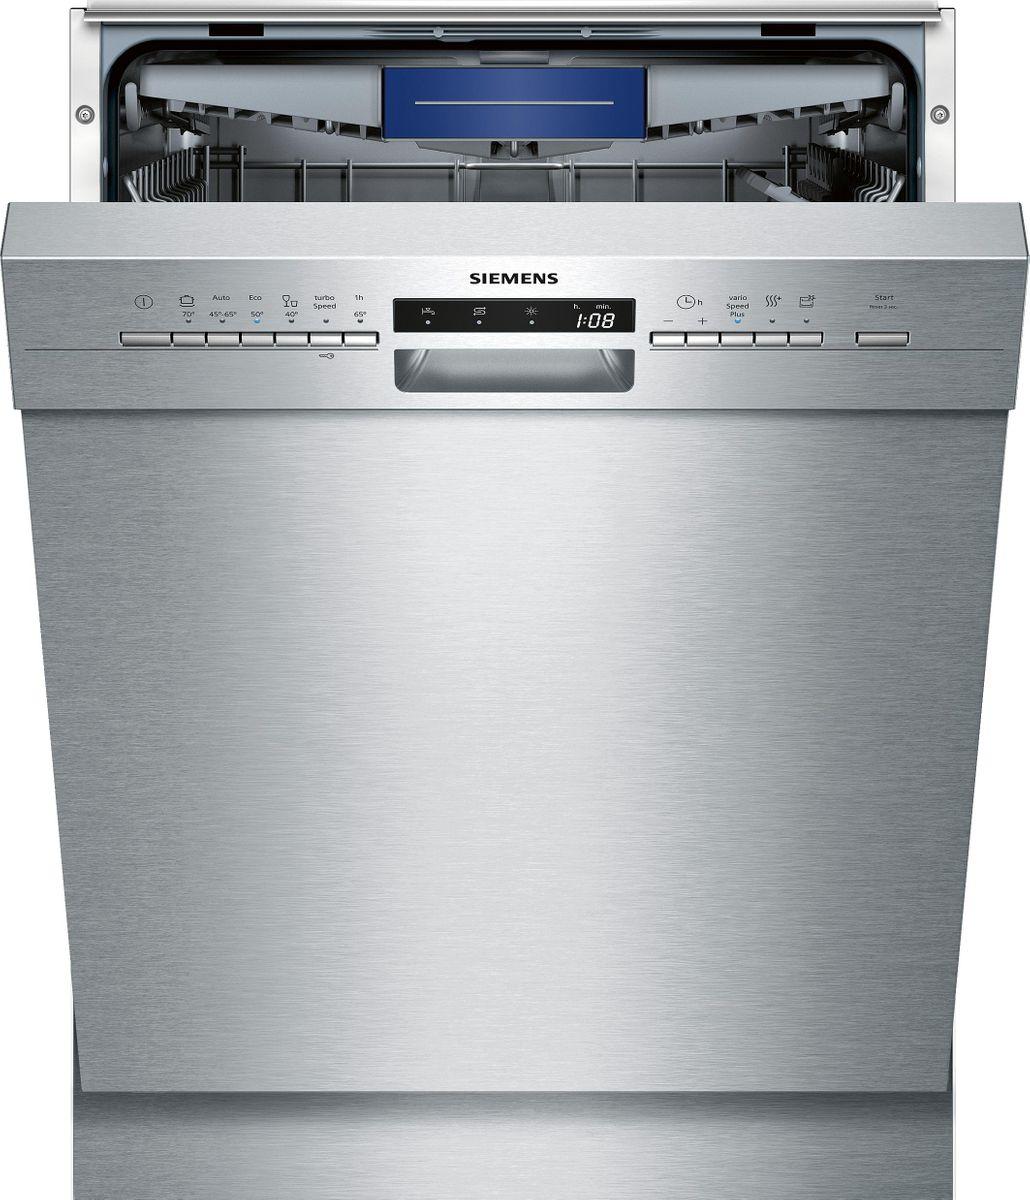 SN436S00KE Unterbaugerät - Edelstahl Geschirrspüler 60 cm Inkl. Sockelblech